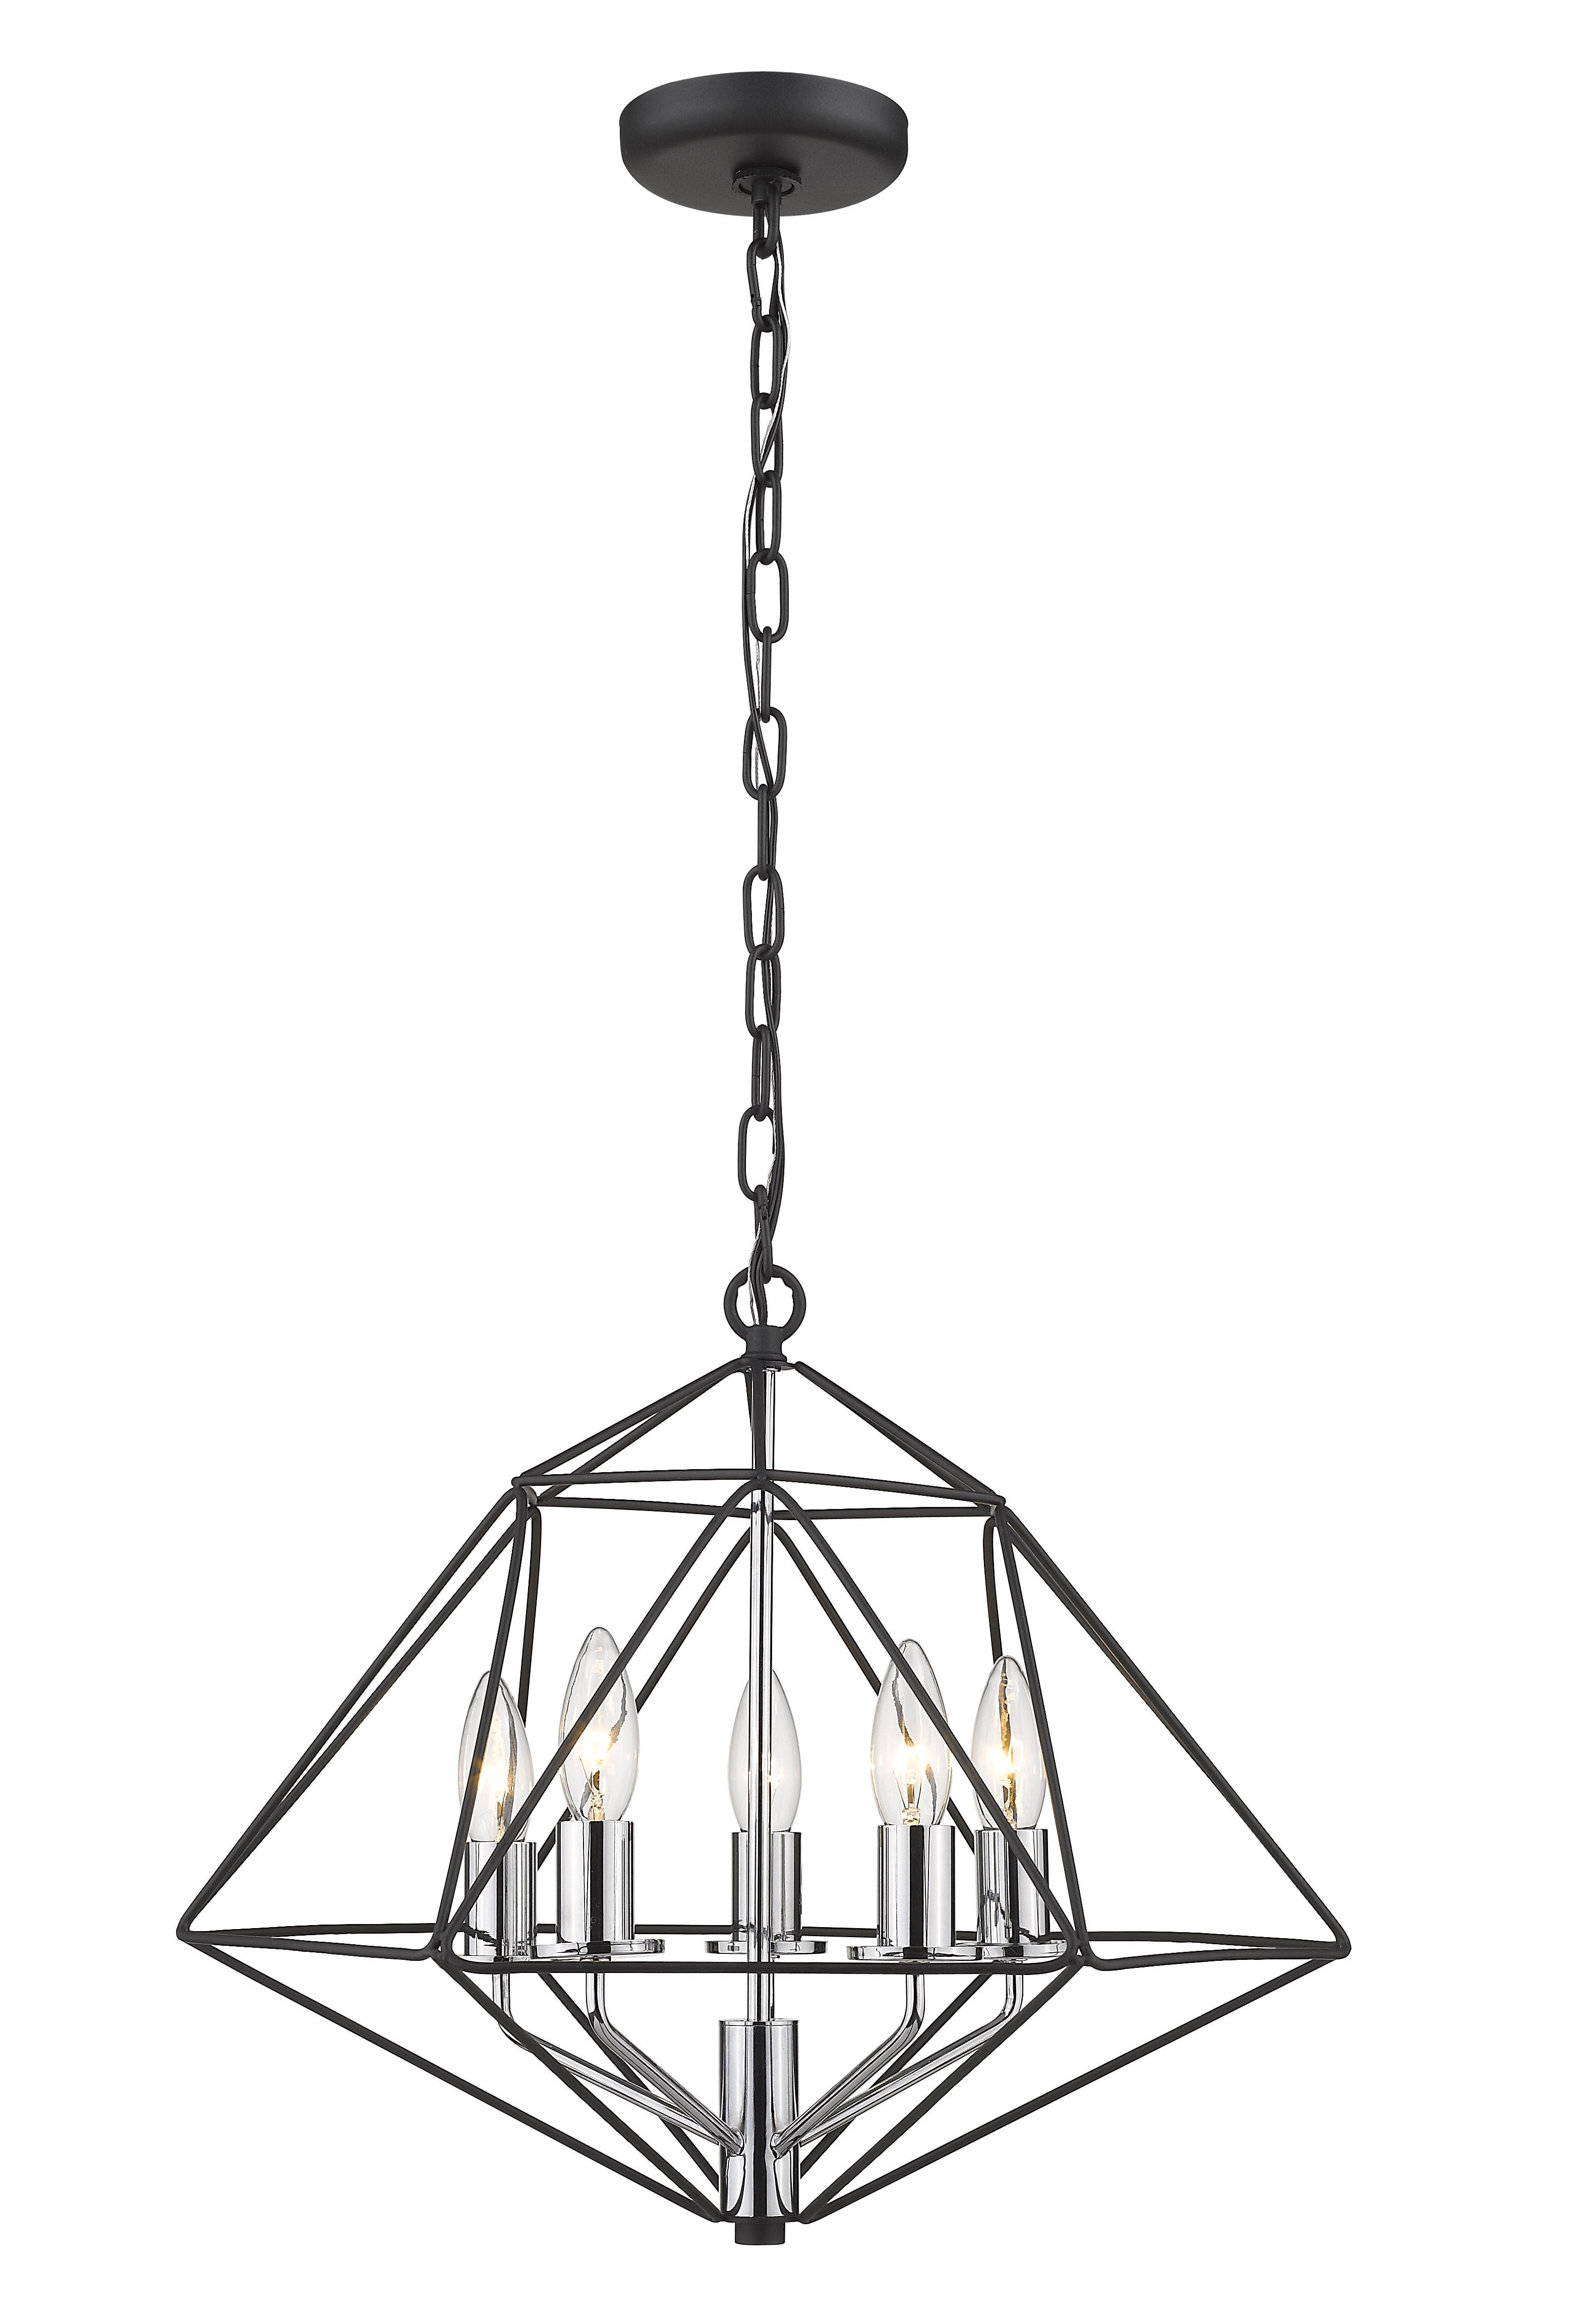 Rockland 4 Light Geometric Pendants With Preferred Kiesel 5 Light Geometric Pendant (Gallery 2 of 20)